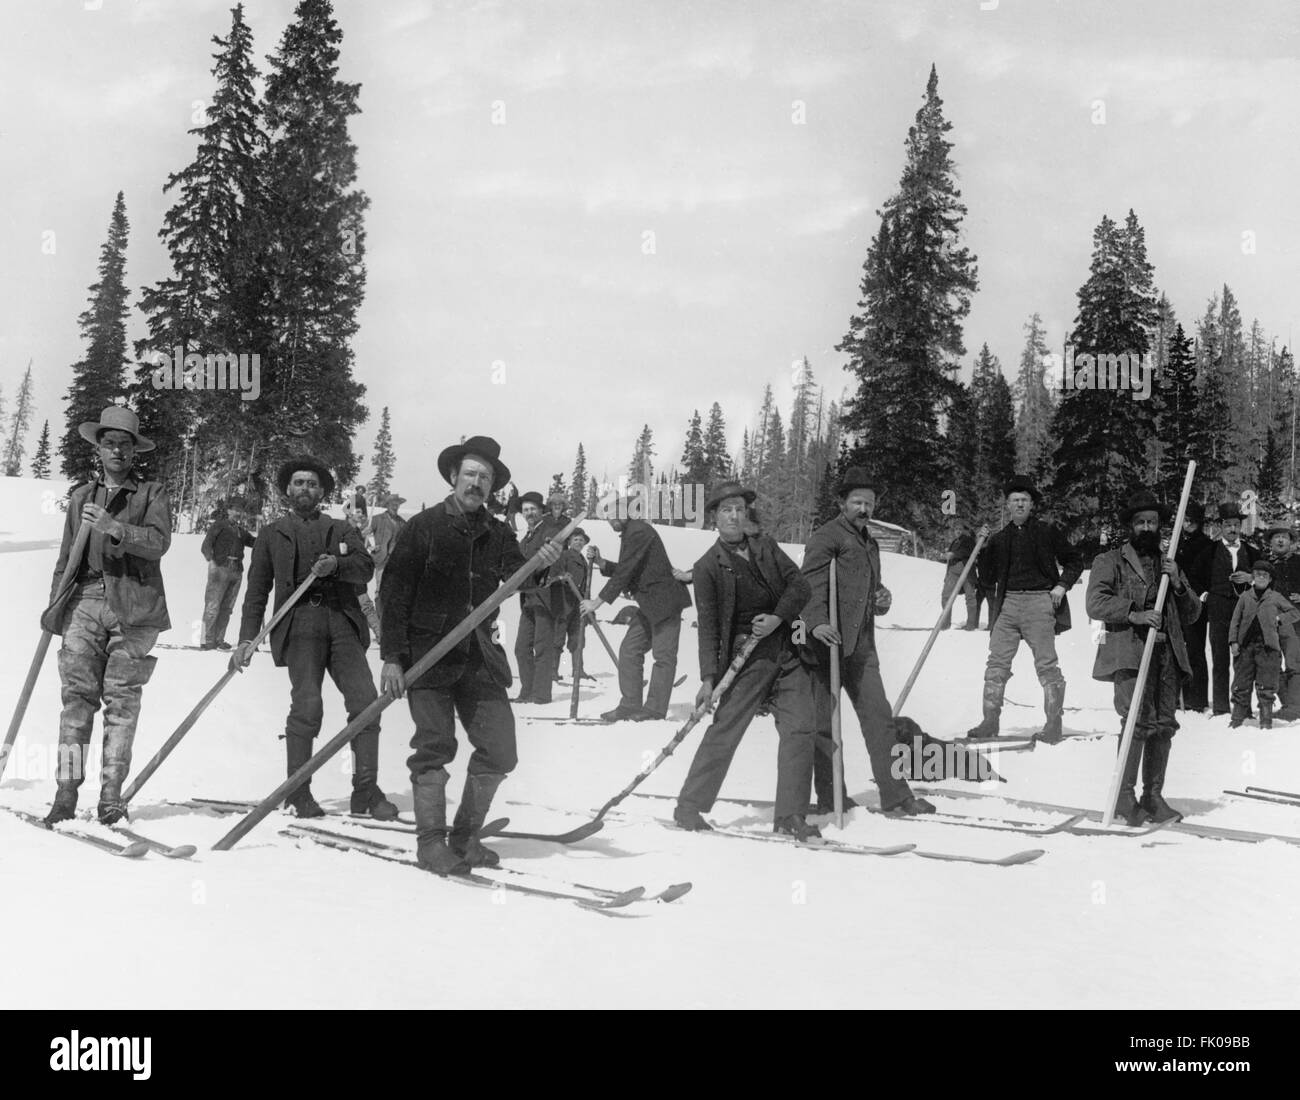 Gruppe von Skifahrern, USA, um 1915 Stockbild